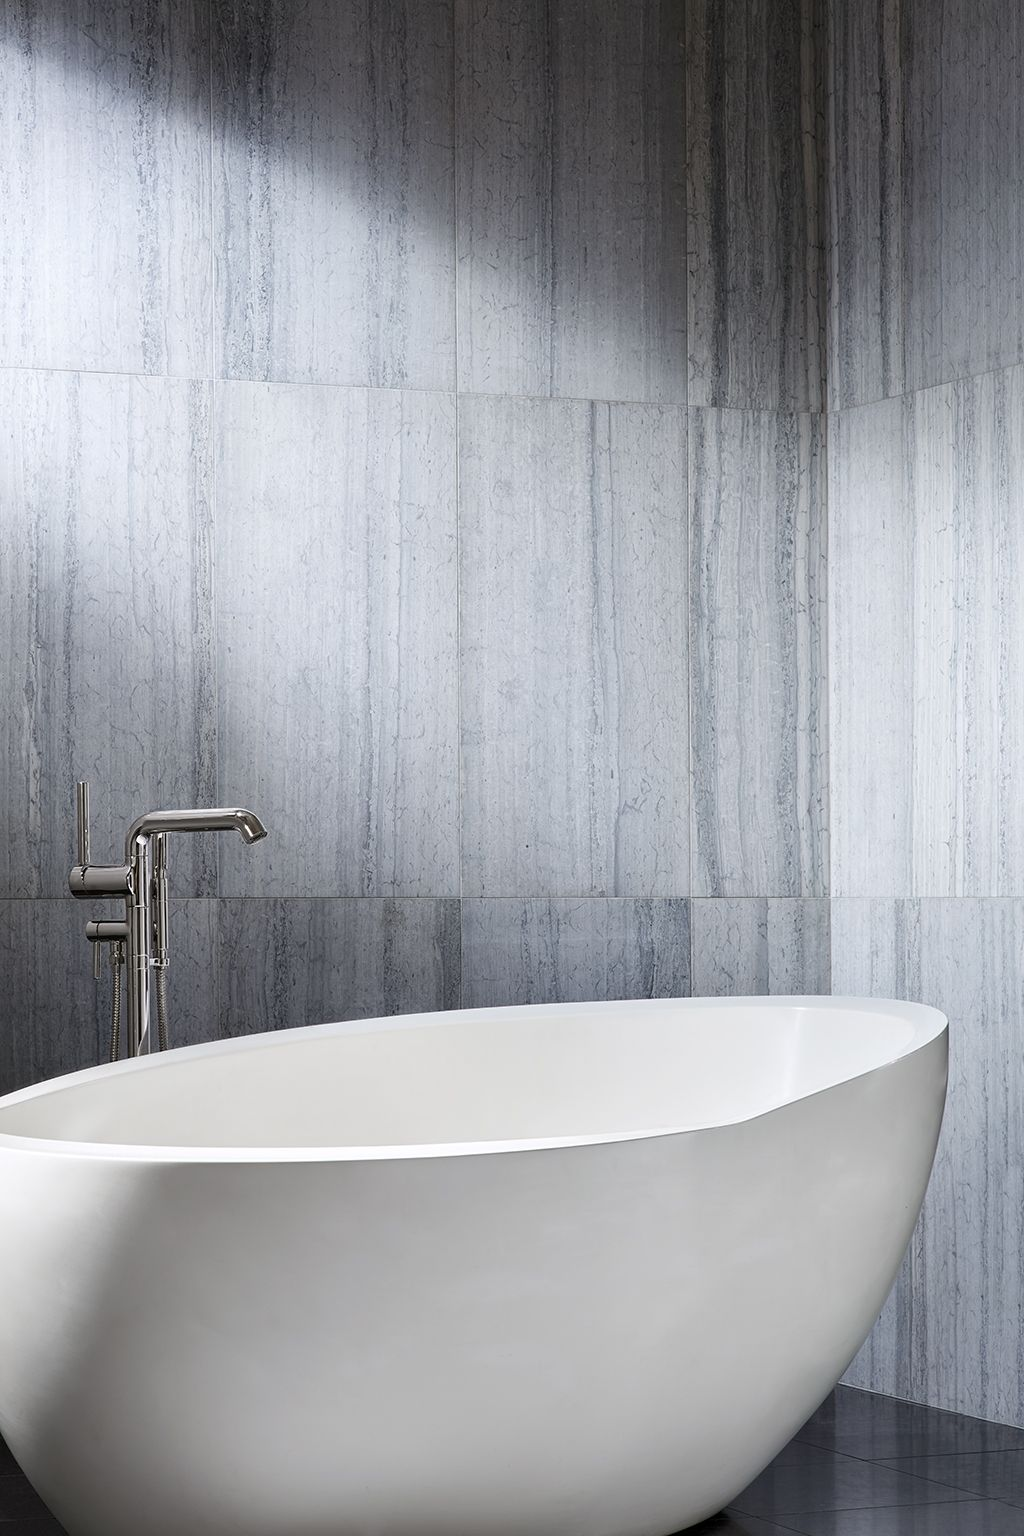 25 70 X 40 X 29 Freestanding Oval Bathtub White Bathroom